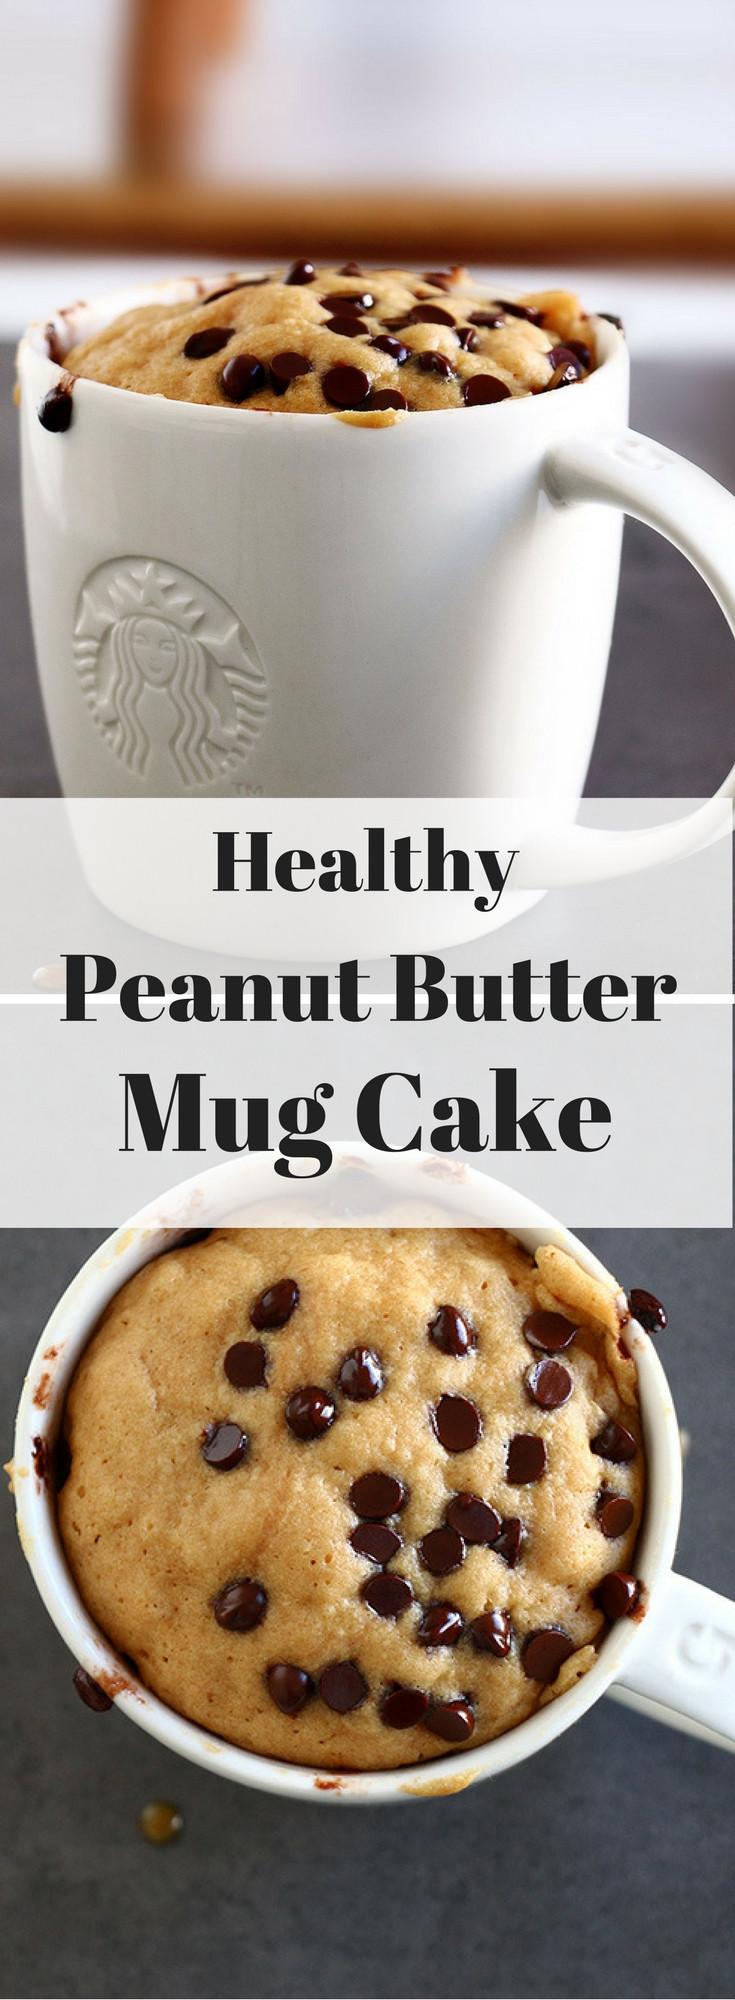 Healthy Mug Cake  Healthy Peanut Butter Mug Cake Baking Ginger